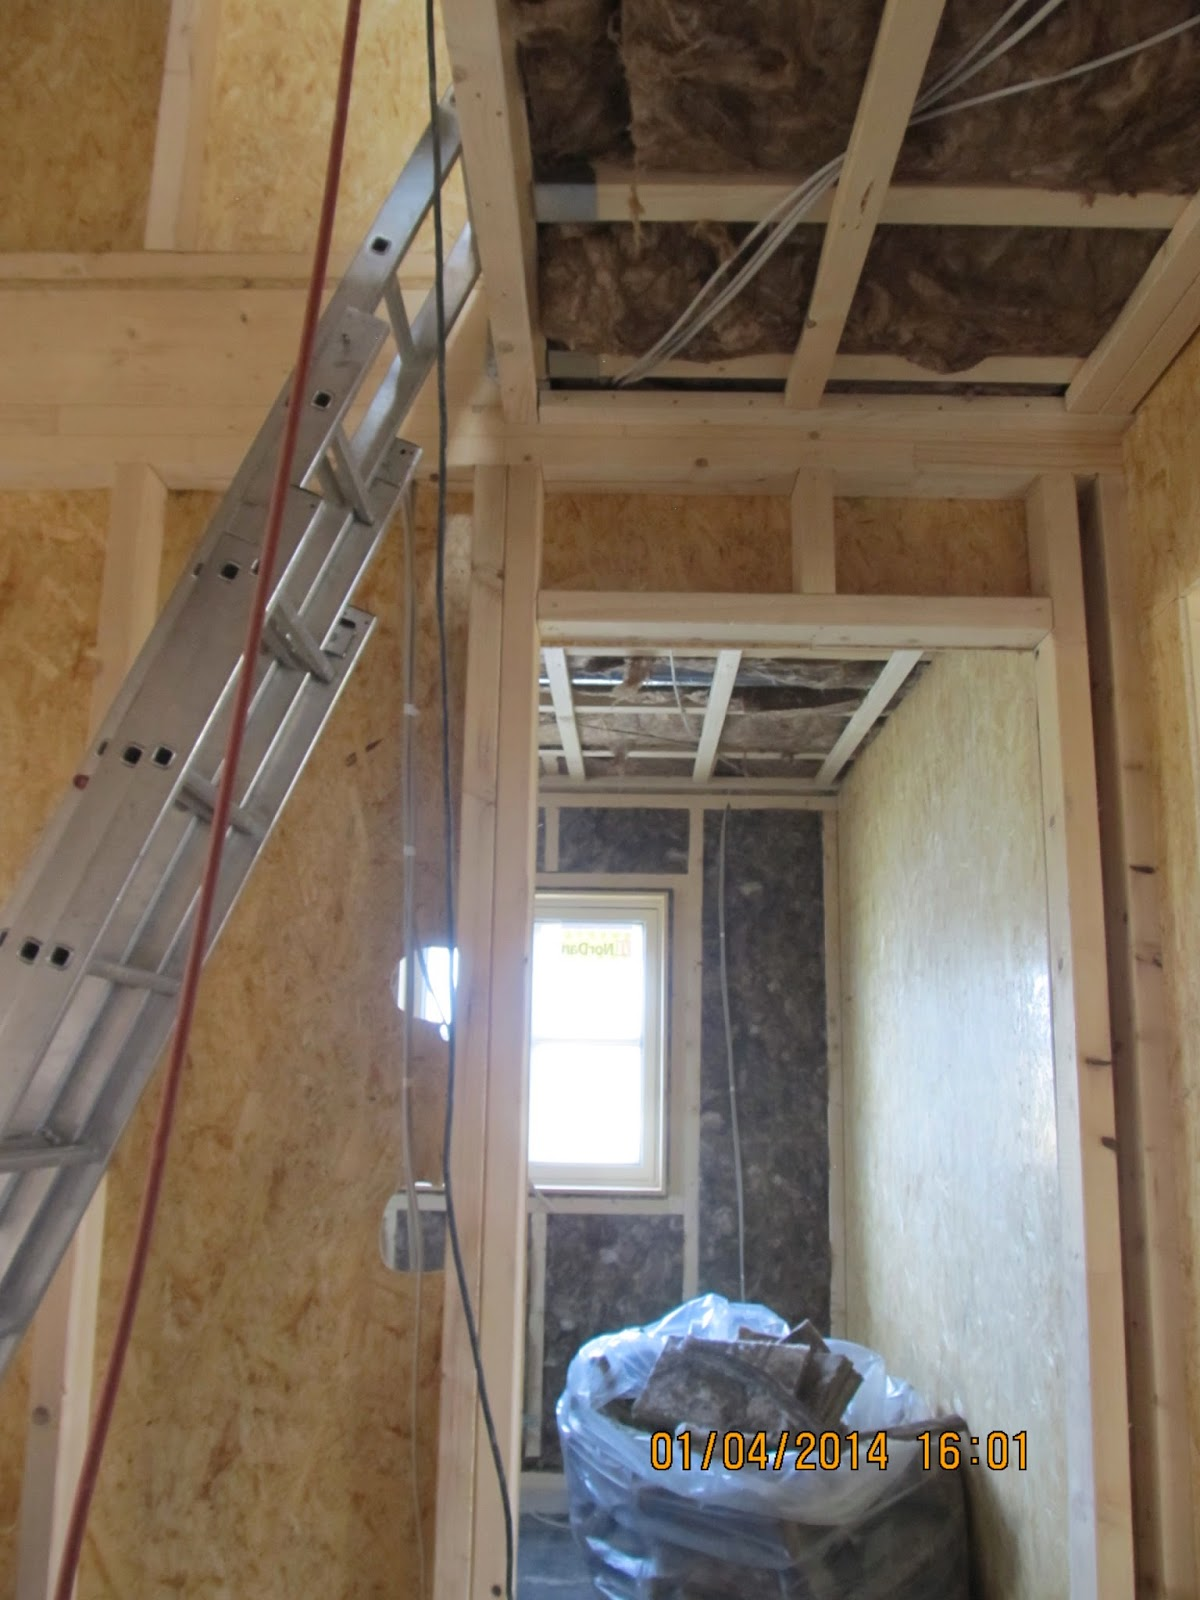 unser norge hus in gro en schritten geht s voran. Black Bedroom Furniture Sets. Home Design Ideas